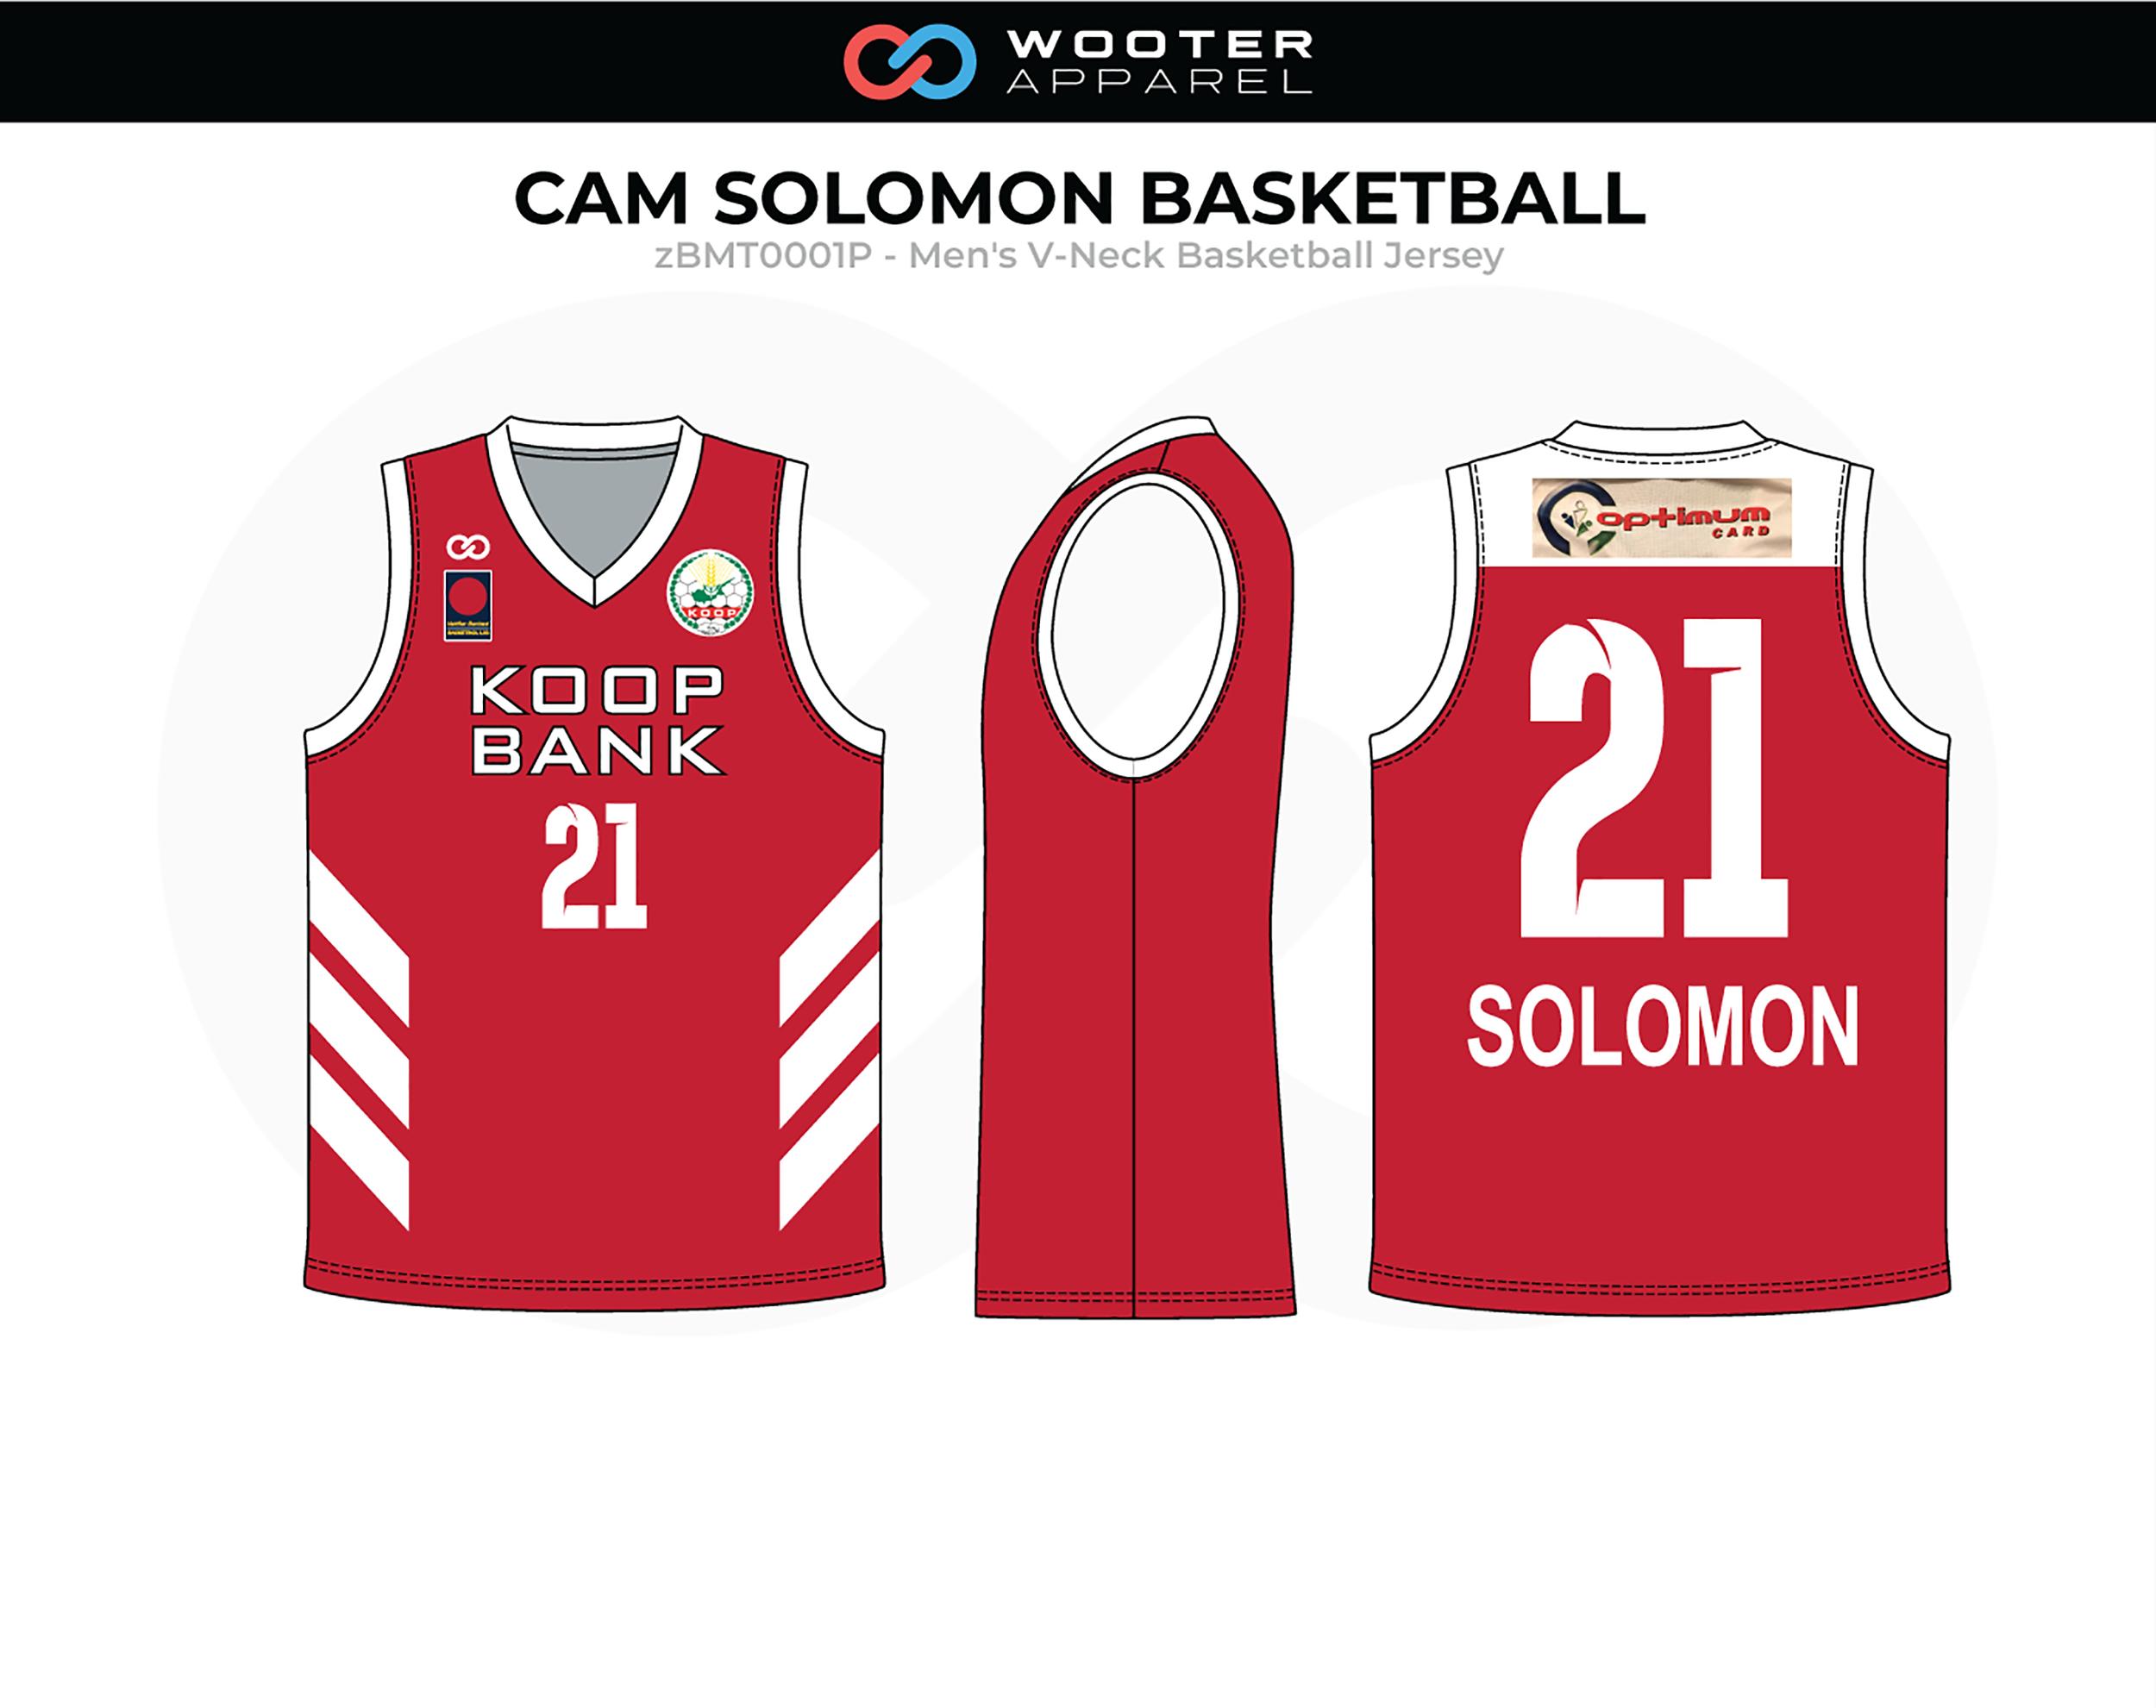 CamSolomonBasketball_RedMockup.png